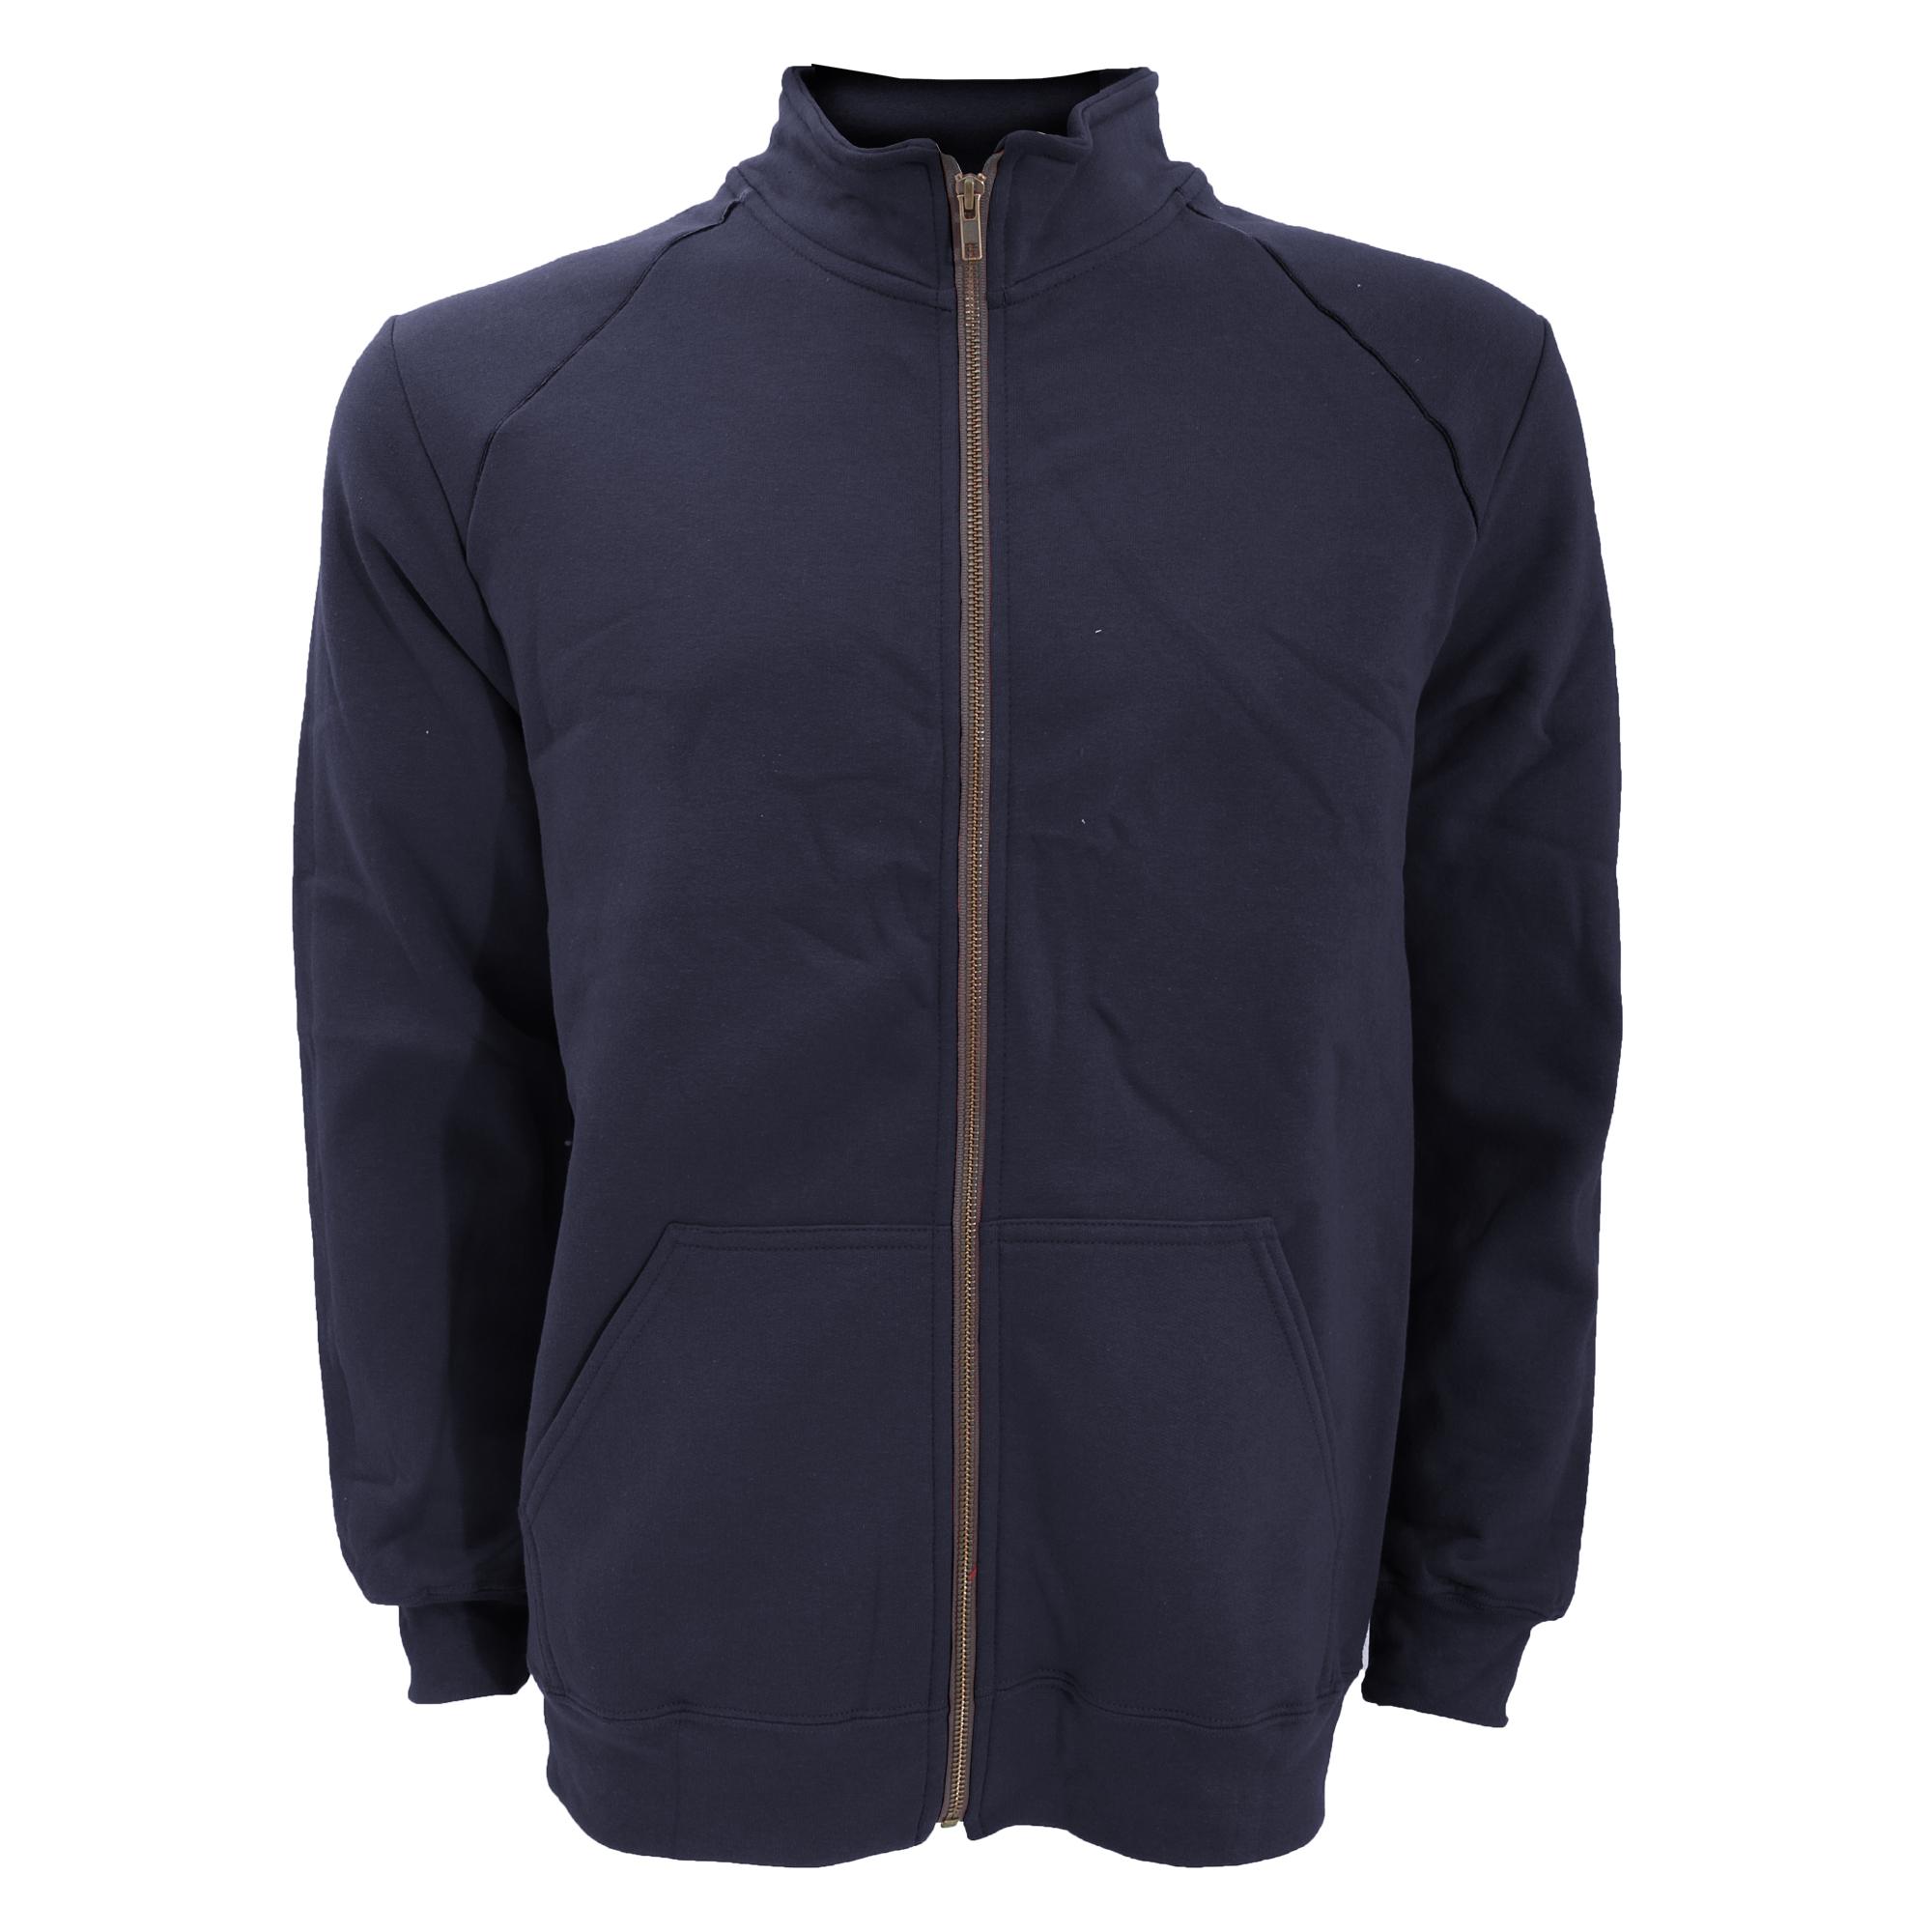 Gildan-Mens-Premium-Cotton-Ringspun-Fleece-Full-Zip-Jacket-L-S-M-2XL-RW3172 thumbnail 3